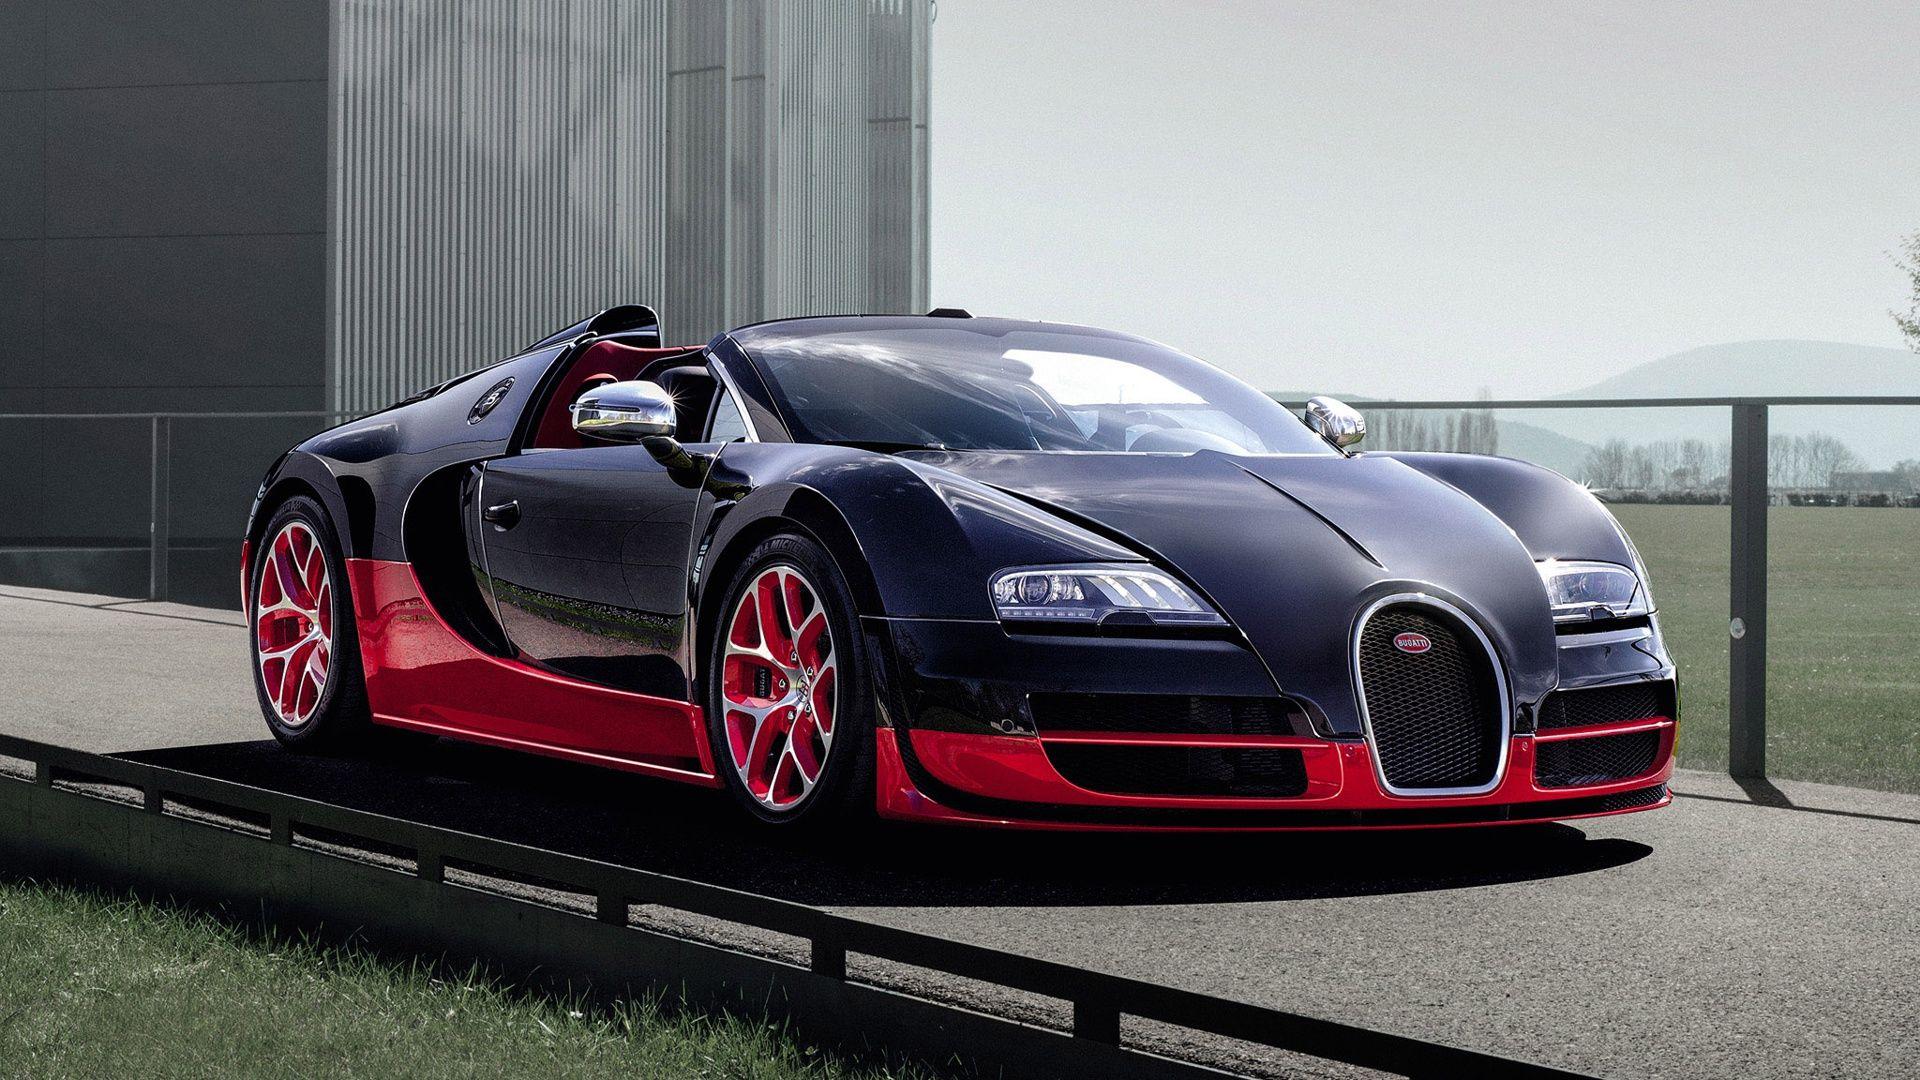 Bugatti Veyron Grand Sport Roadster Vitesse On Hd Wallpaper From